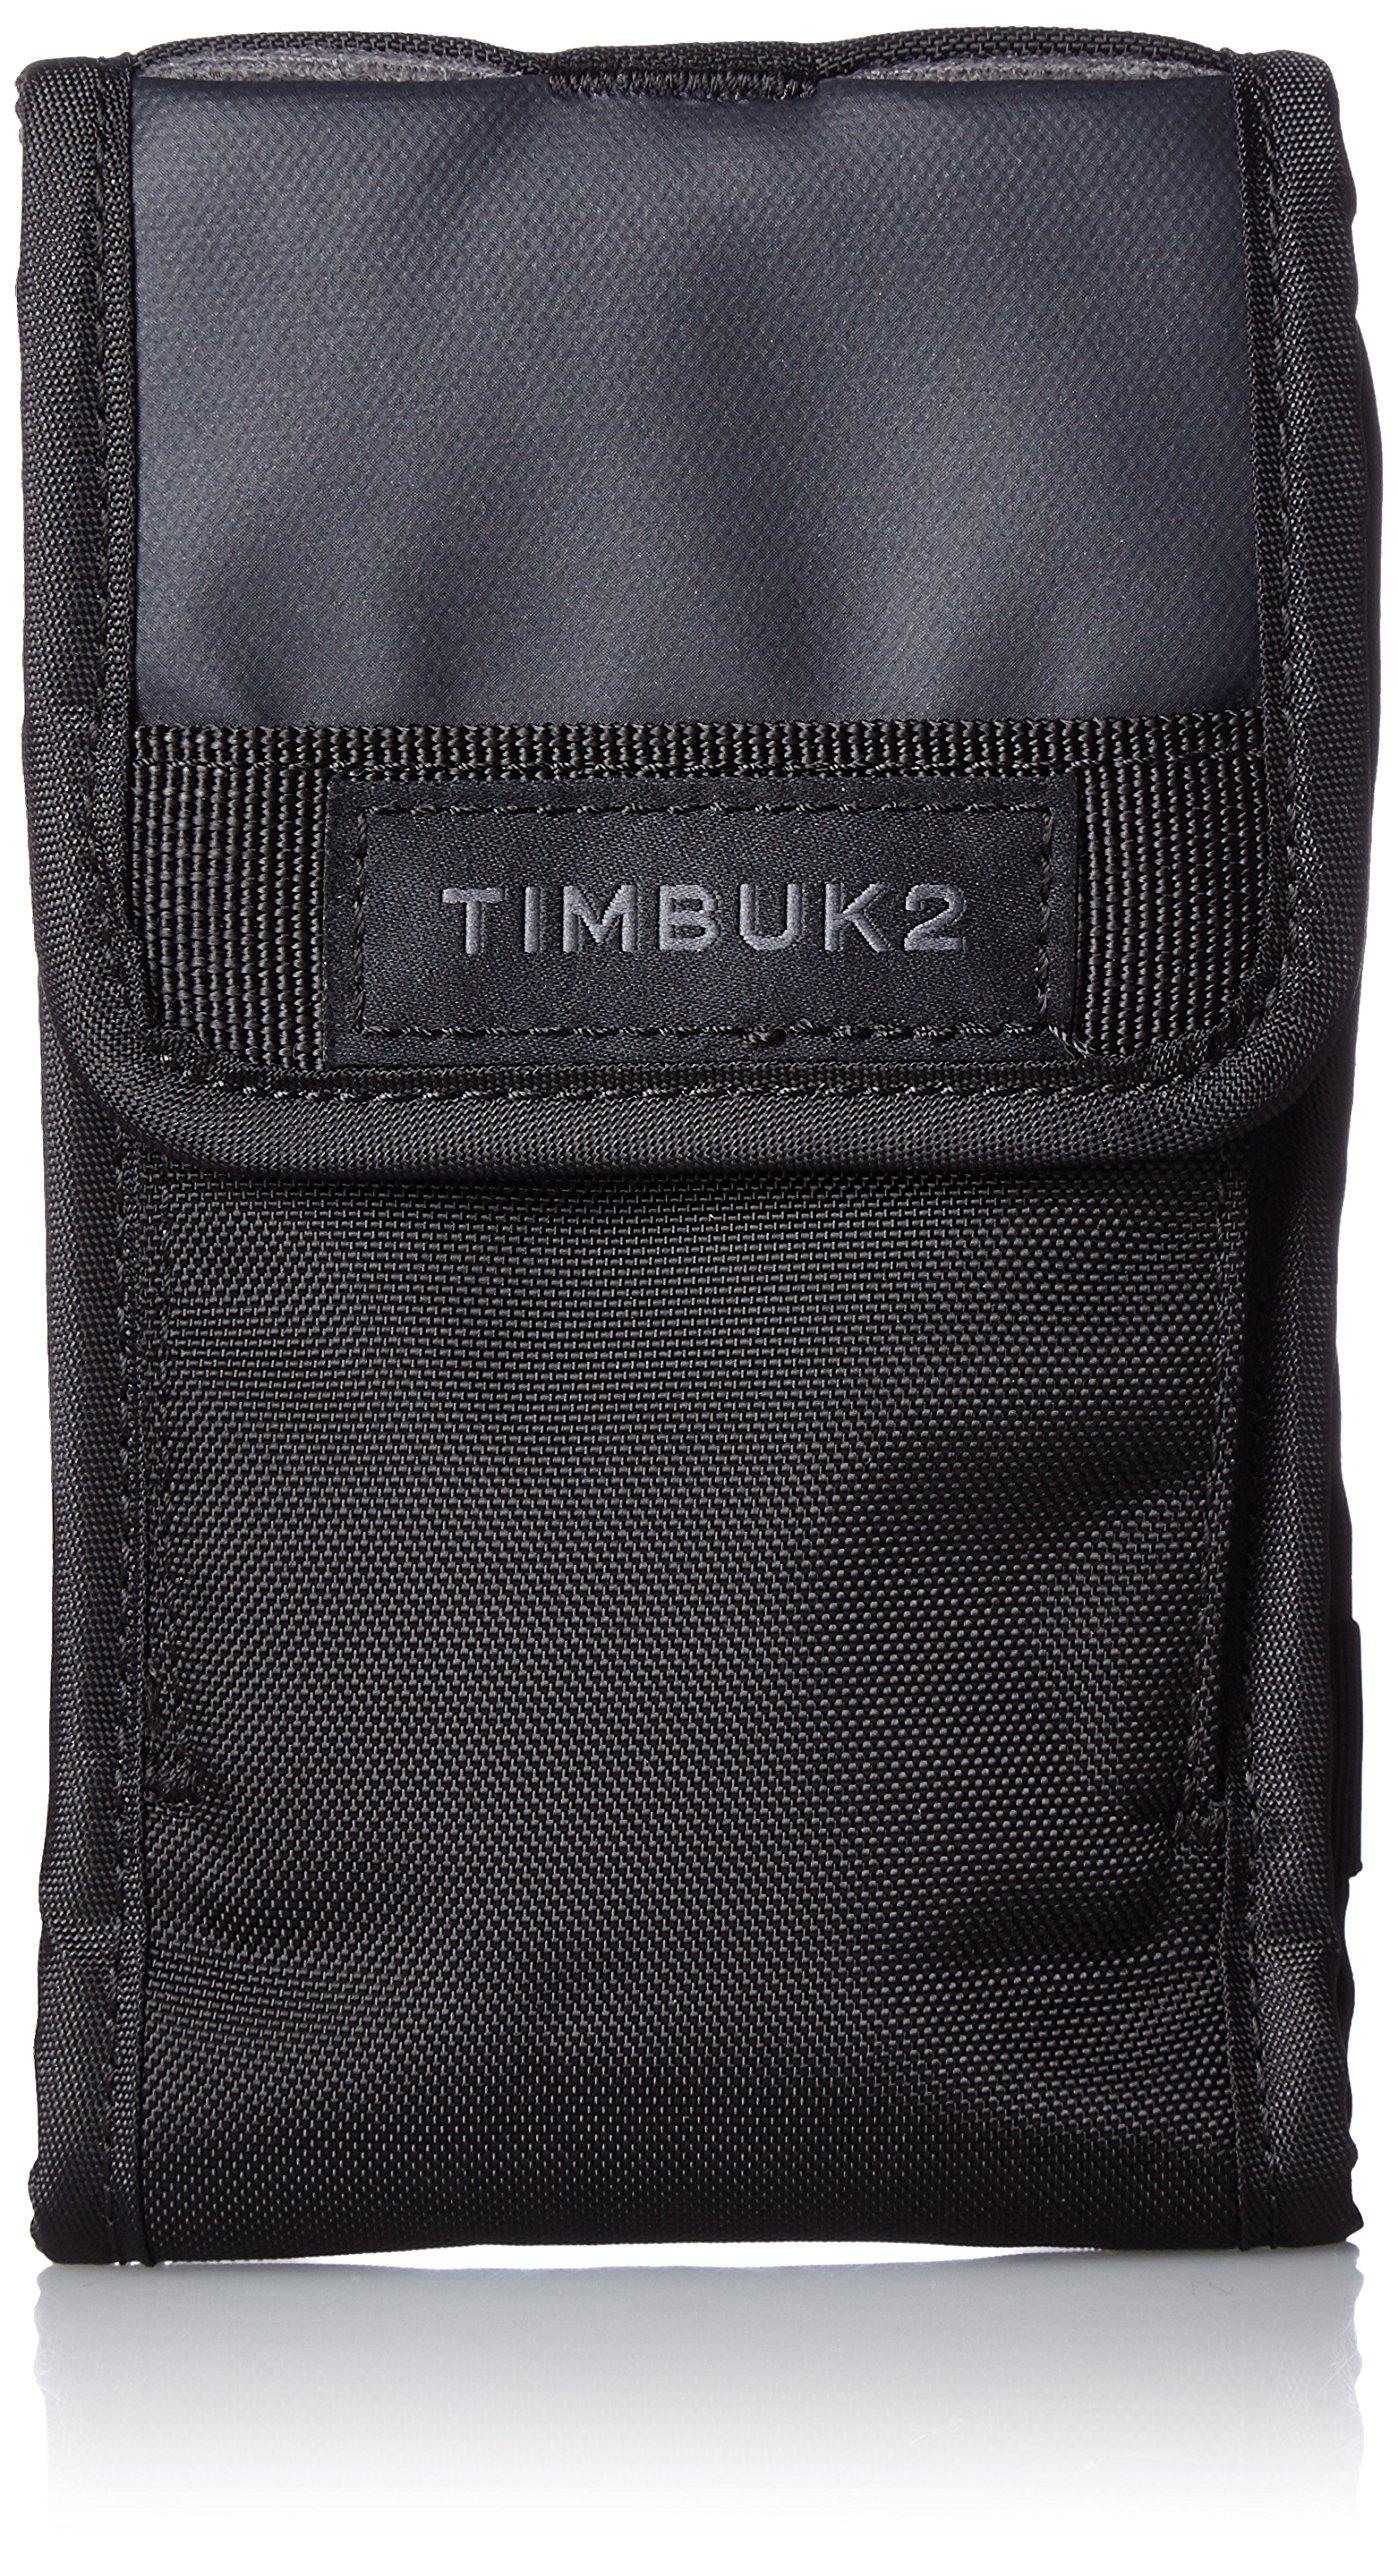 Timbuk2 3 Way Accessory Case, Black, Large by Timbuk2